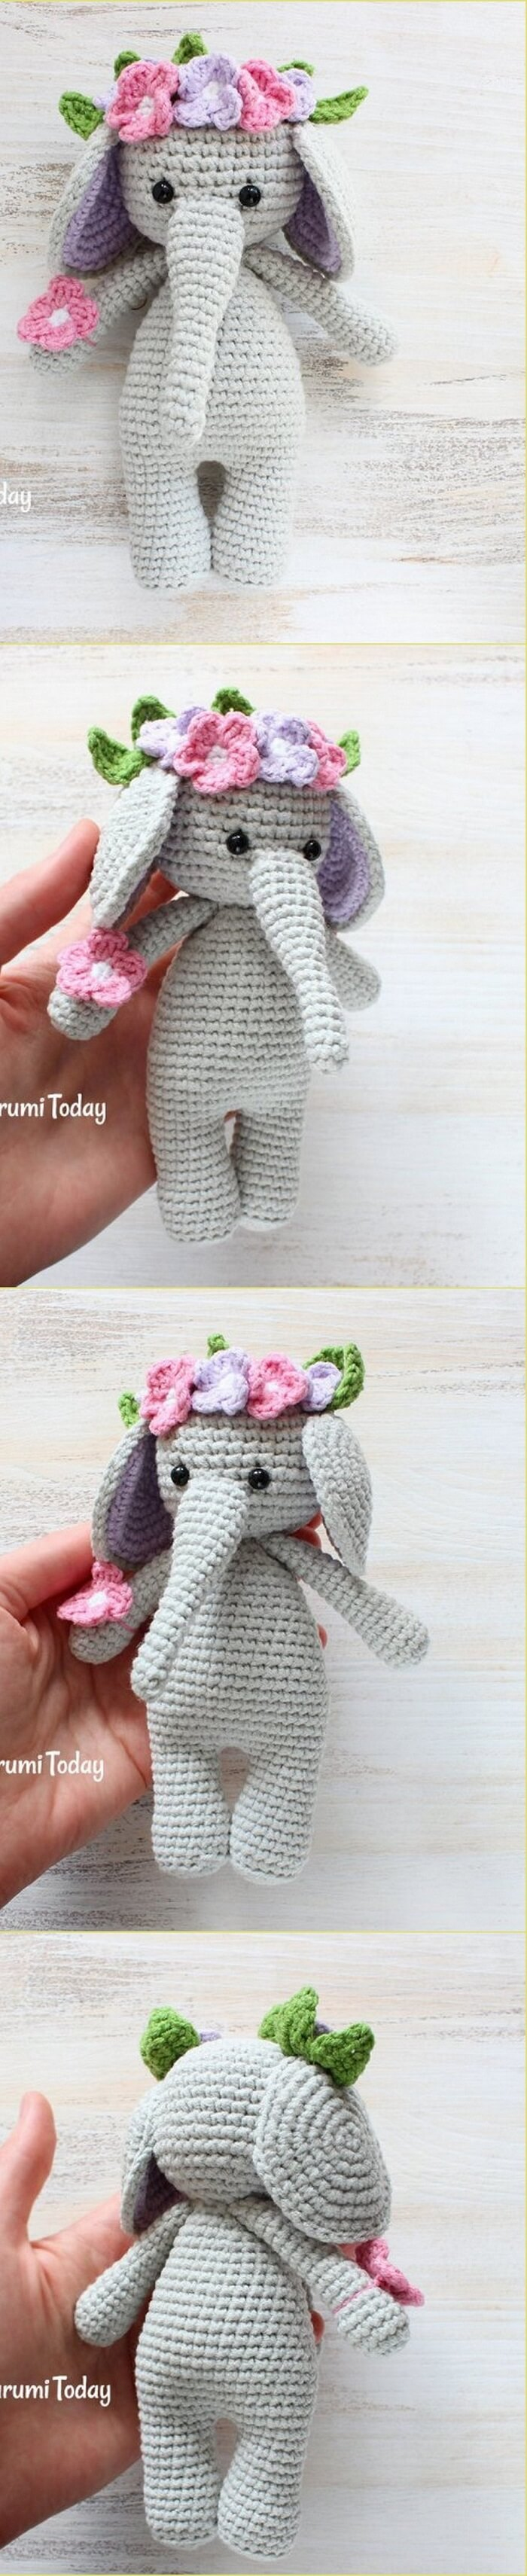 Crochet toys Ideas